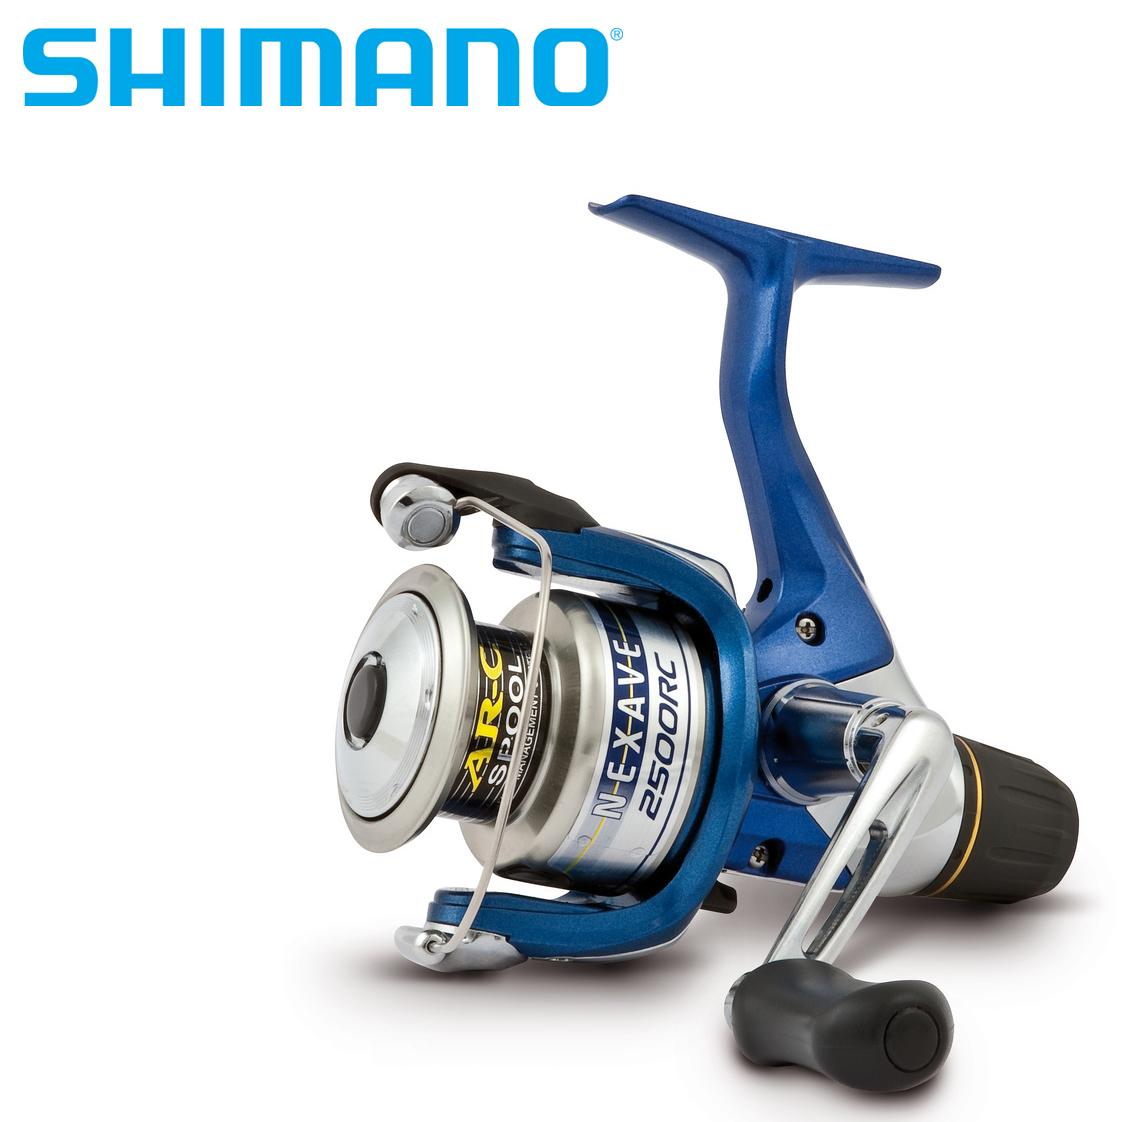 Катушка безынерционная SHIMANO NEXAVE 1000 RC